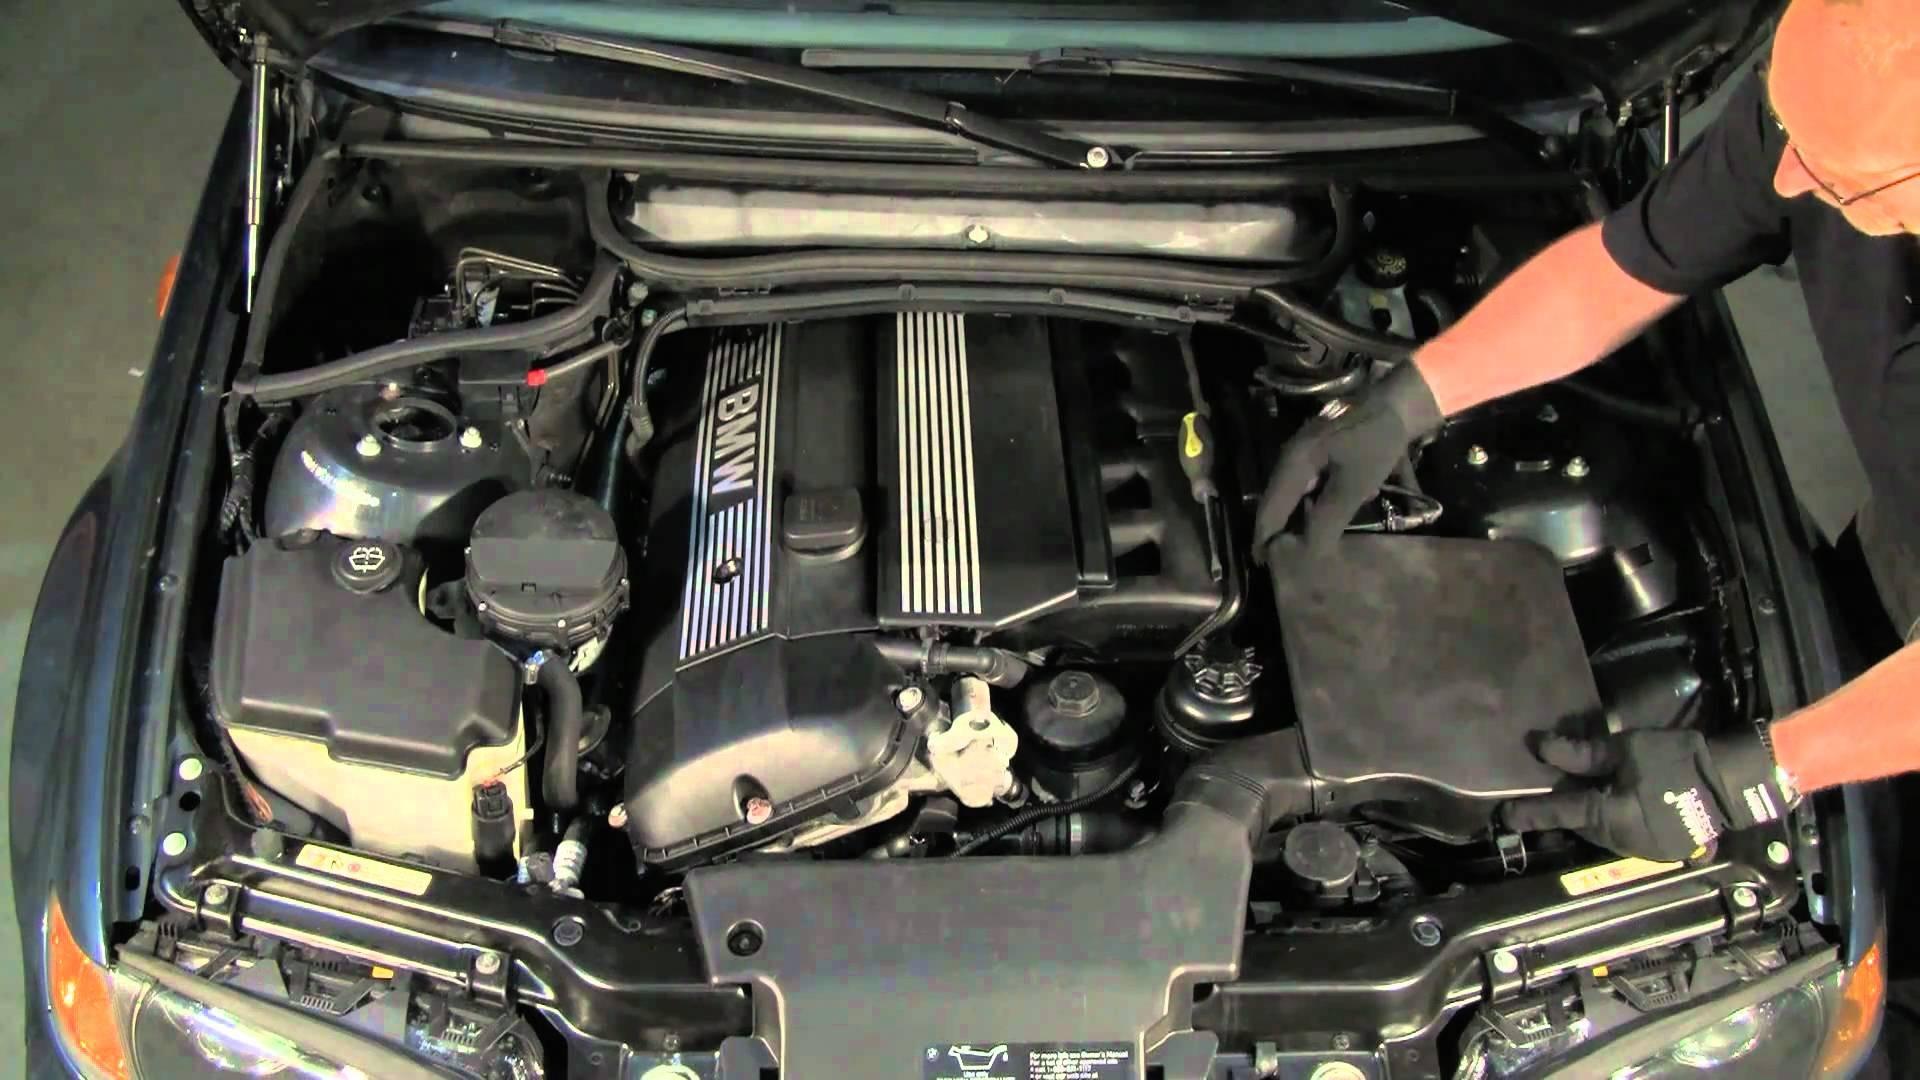 1996 Bmw 328i Engine Diagram Under the Hood A Bmw 3 Series 99 Thru 05 Of 1996 Bmw 328i Engine Diagram